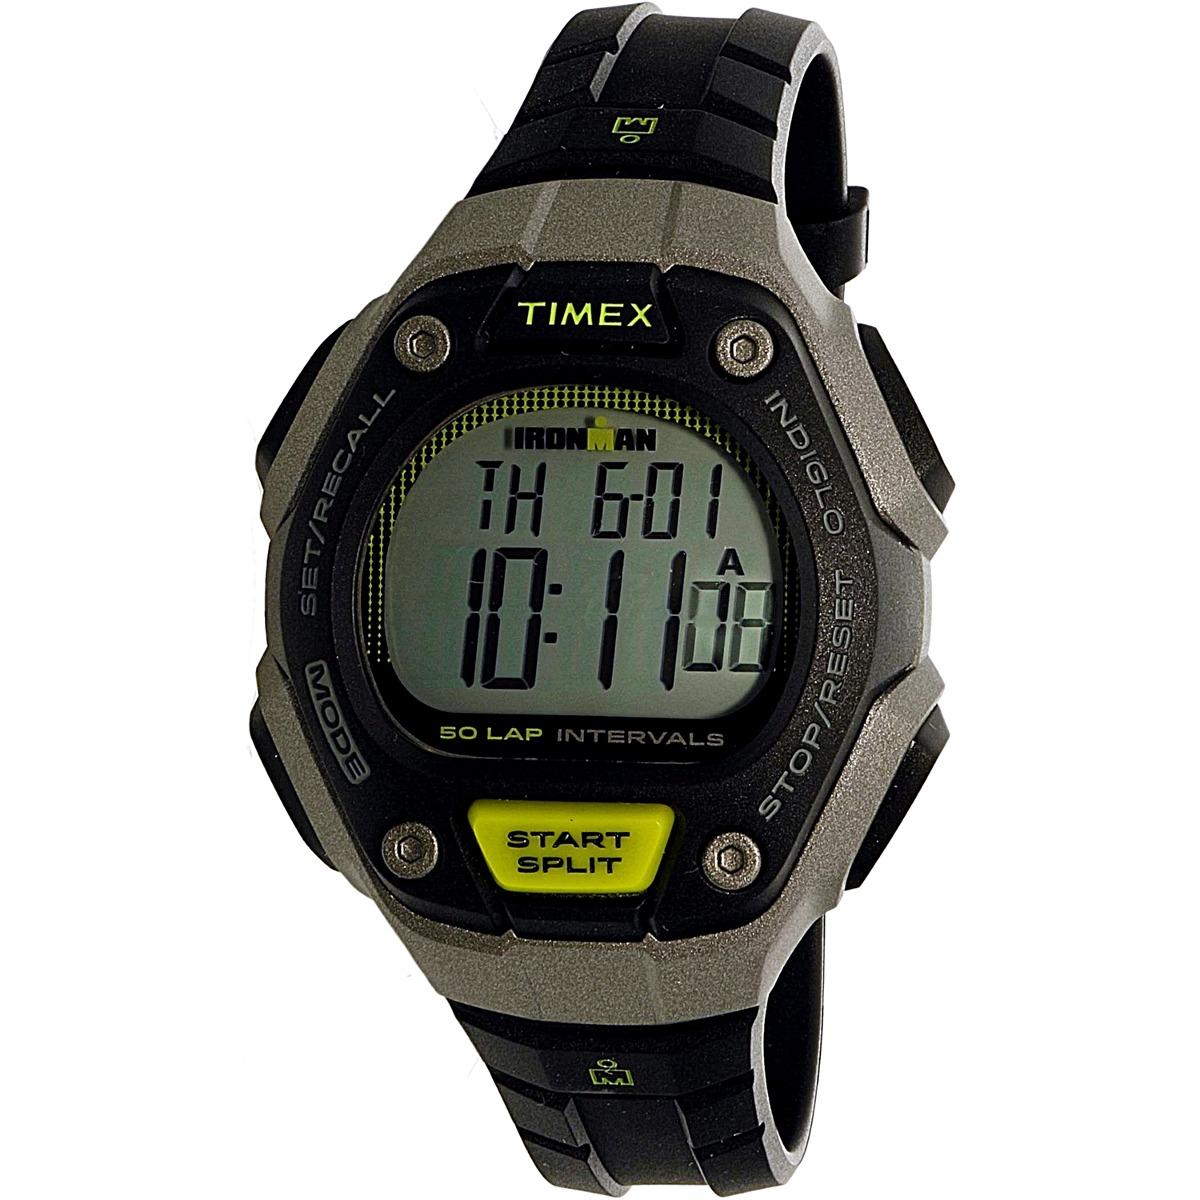 b490fb98f1f3 Reloj Timex Para Hombre Tw5k93200 Poliuretano Deportivo -   252.550 ...